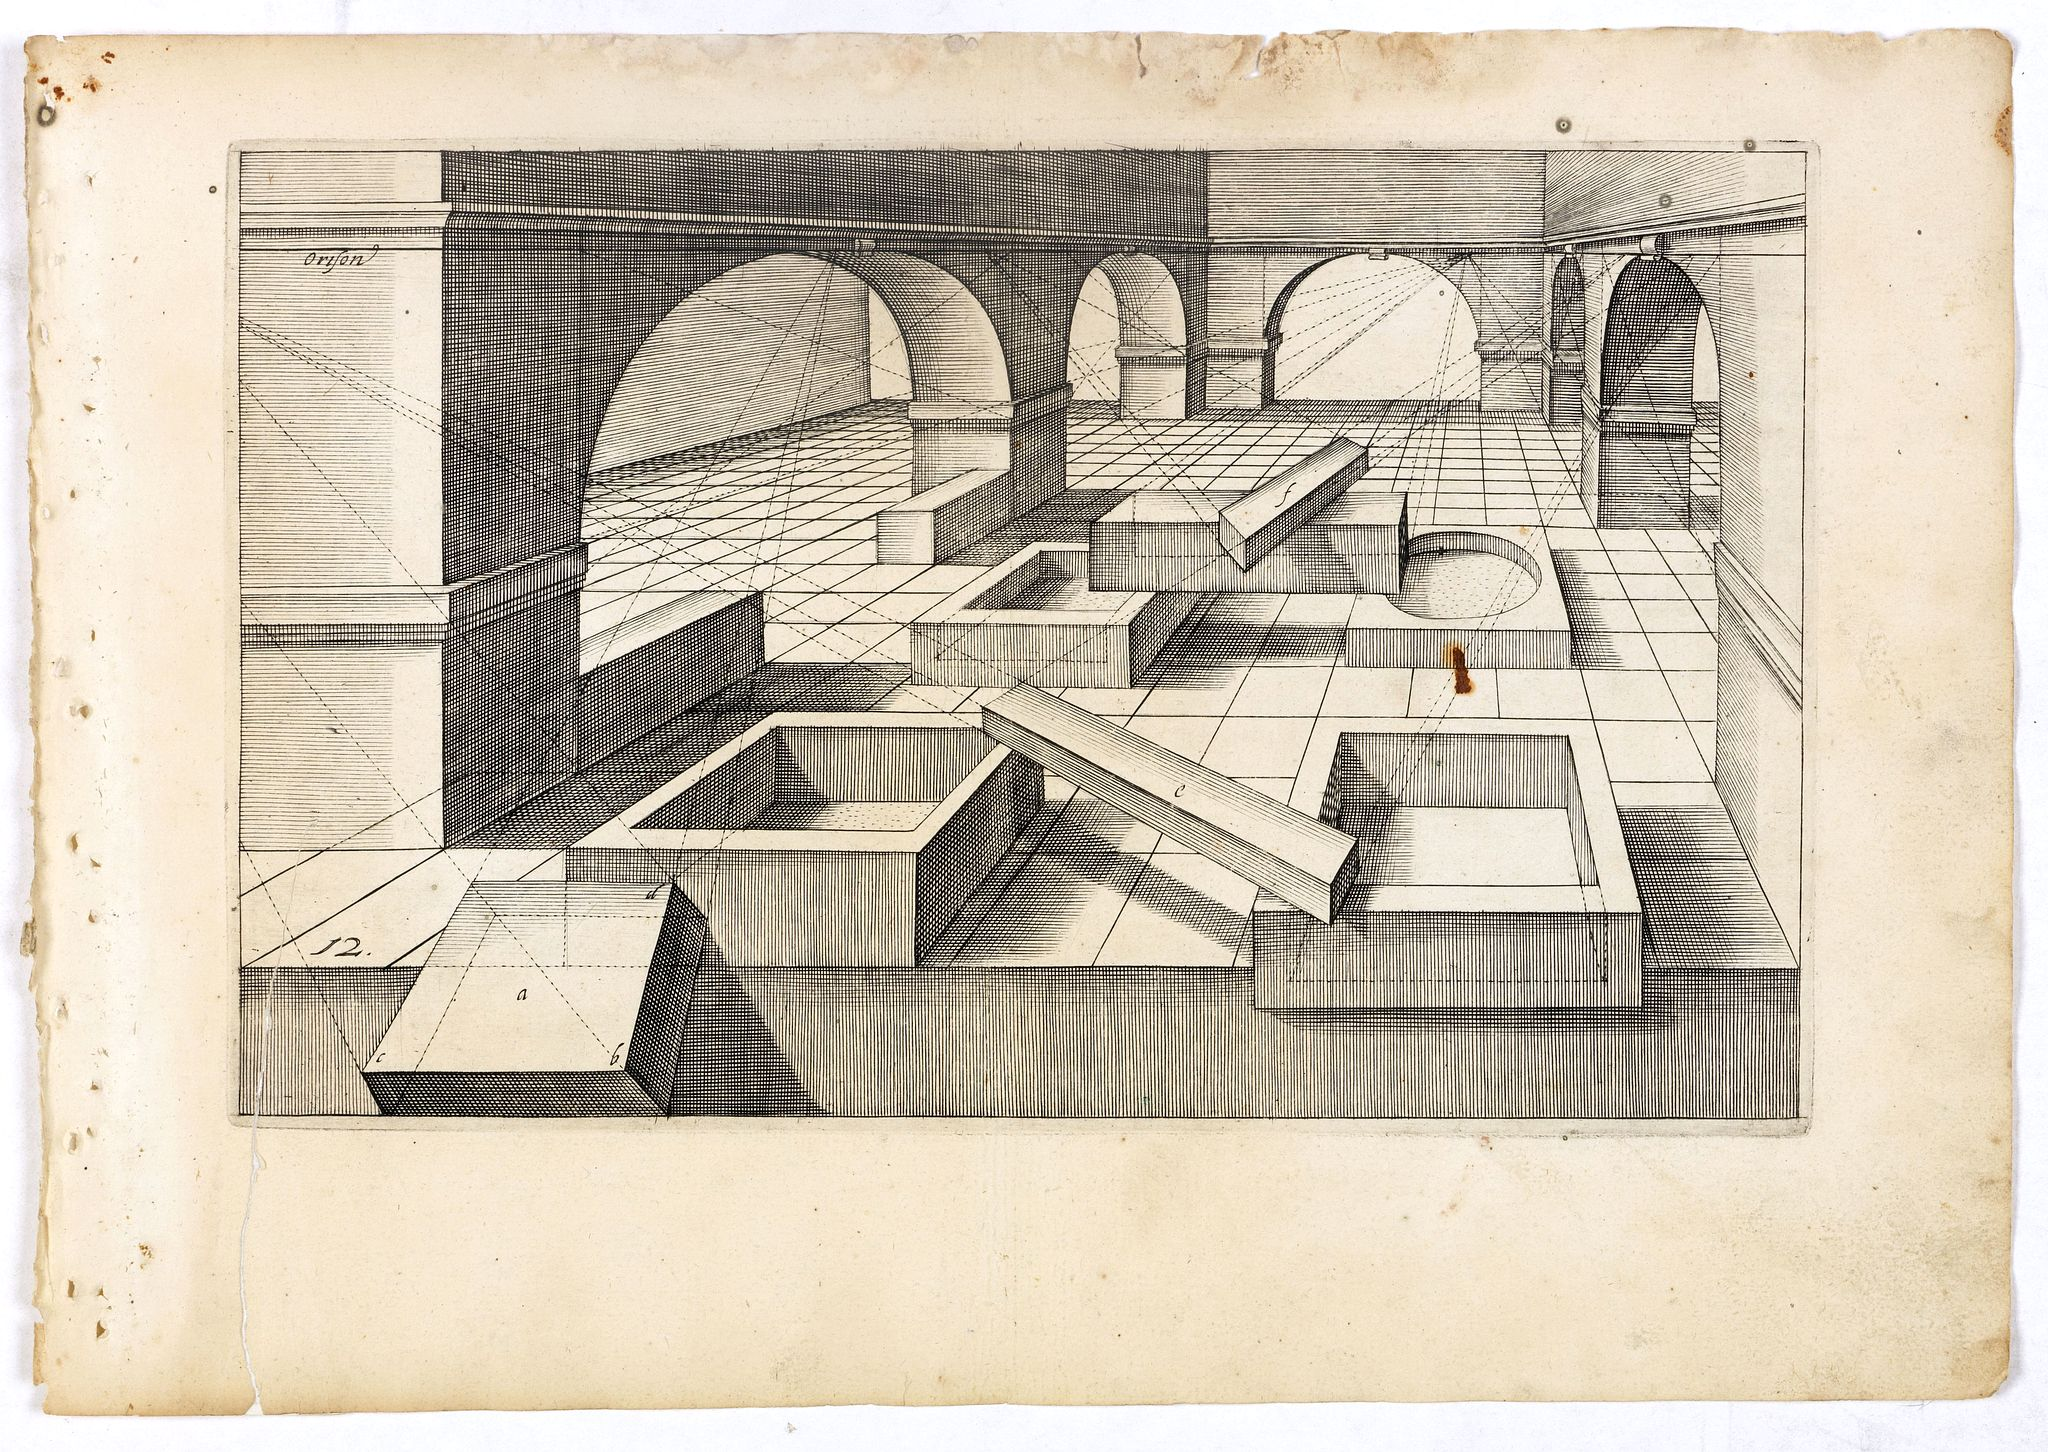 VREDEMAN DE VRIES, J. / HONDIUS, H. -  Perspective print by Vredeman de Vries. 12